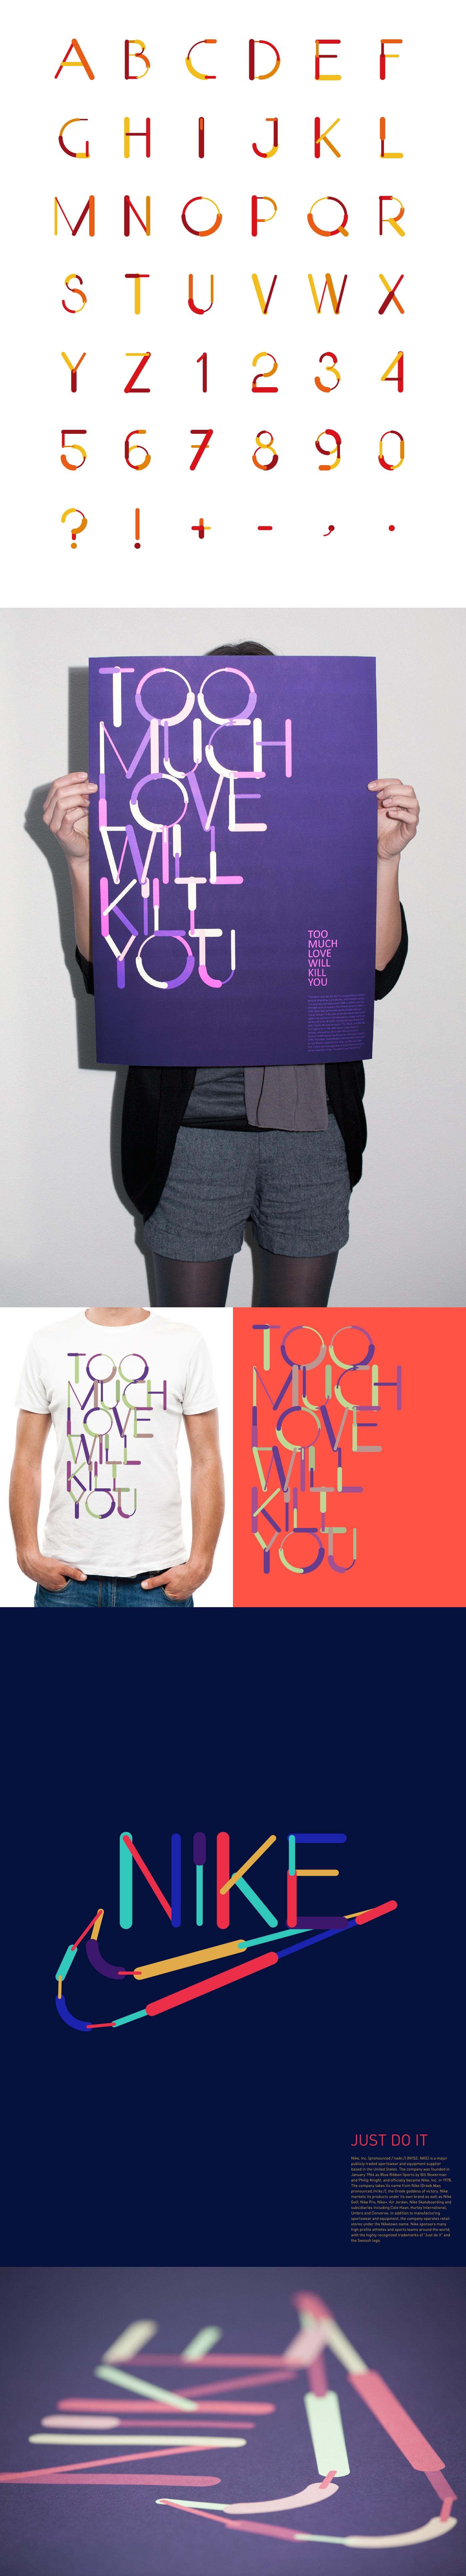 Adobe Portfolio Nike color lines partline font queen anton gridz ukraine